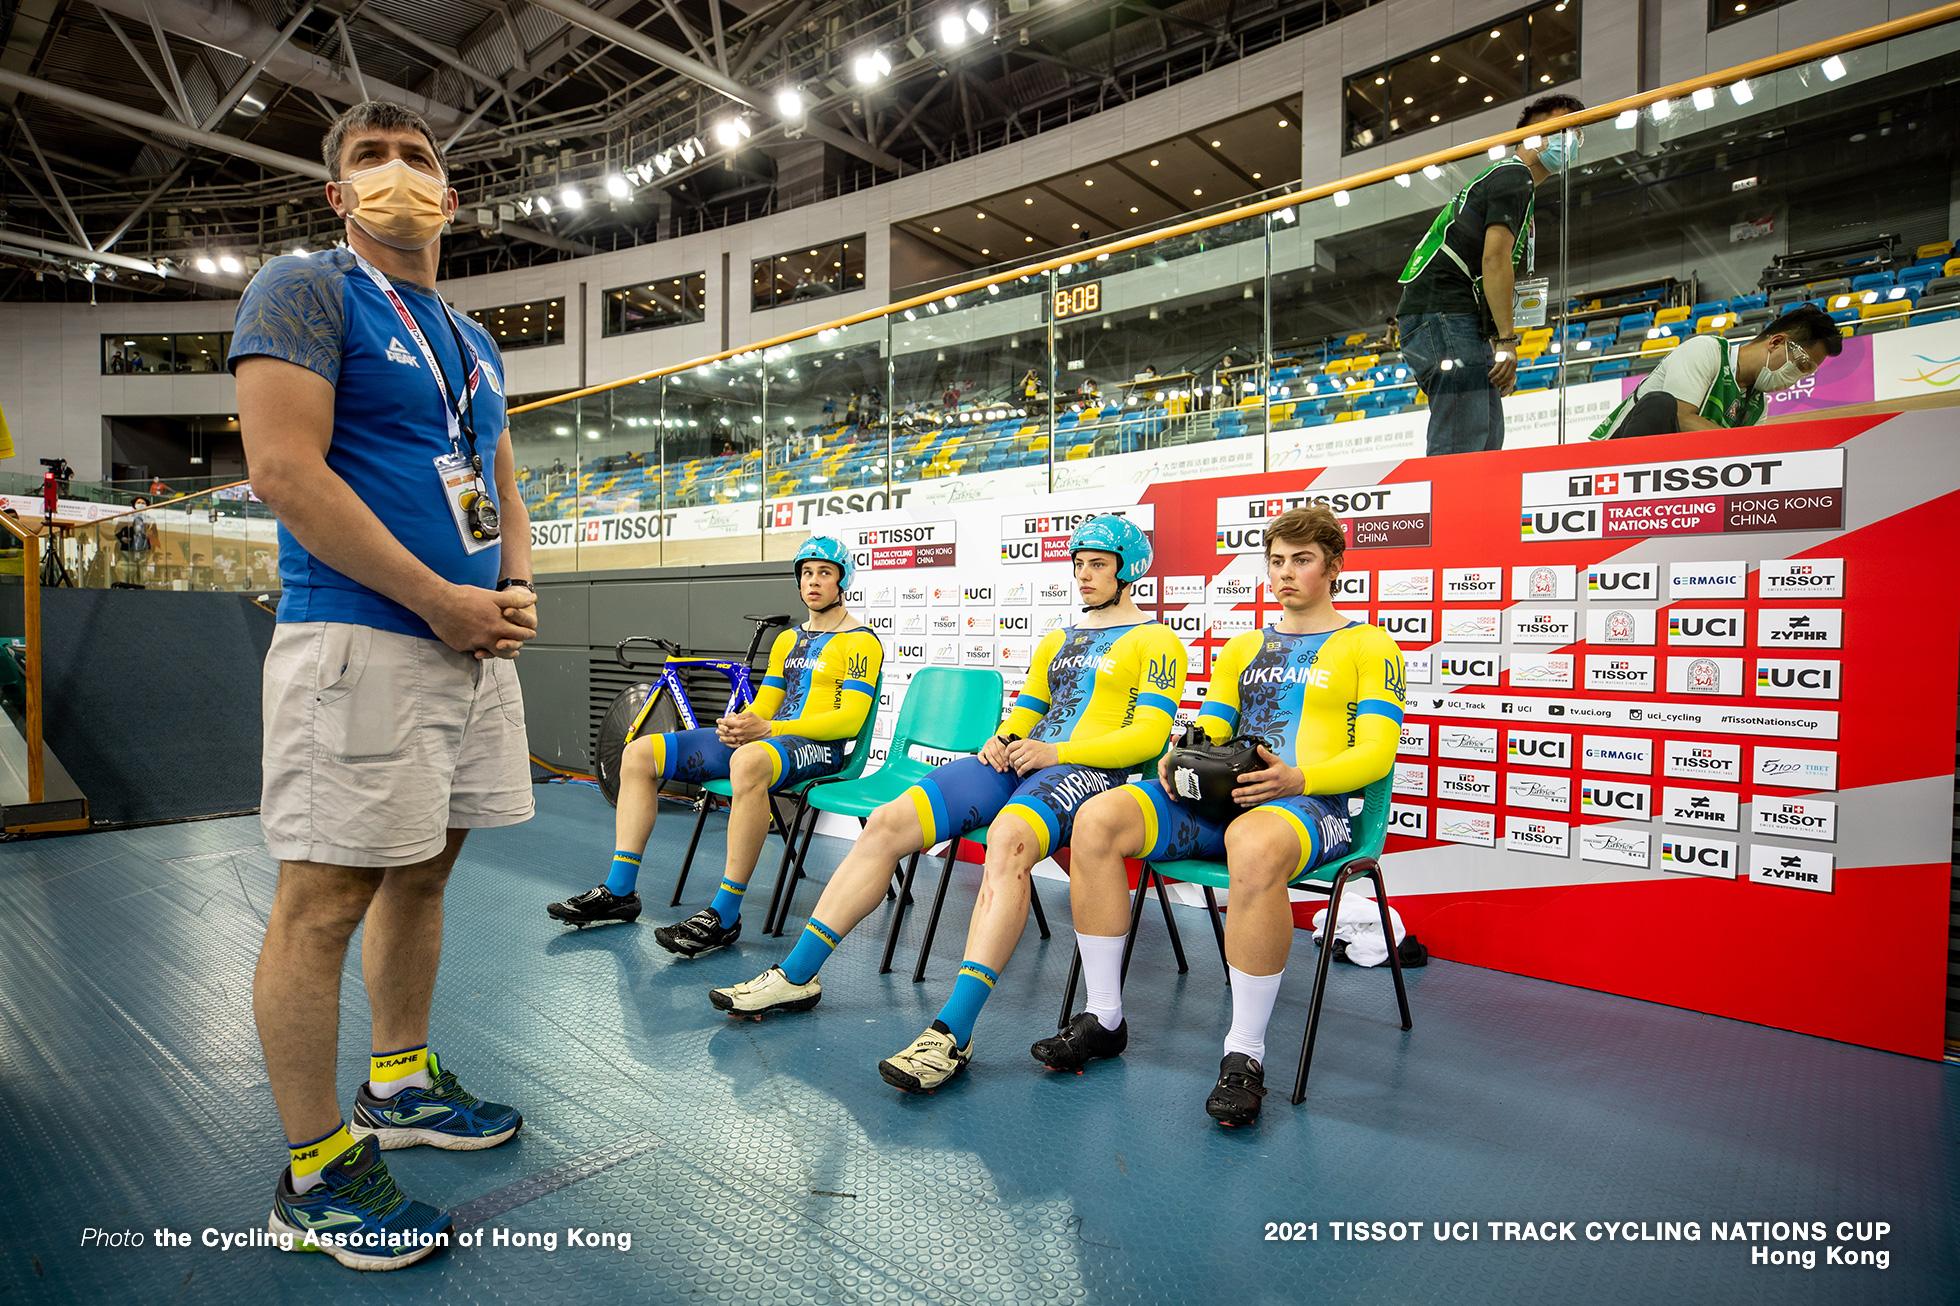 Men's Team Sprint, TISSOT UCI TRACK CYCLING NATIONS CUP - HONG KONG